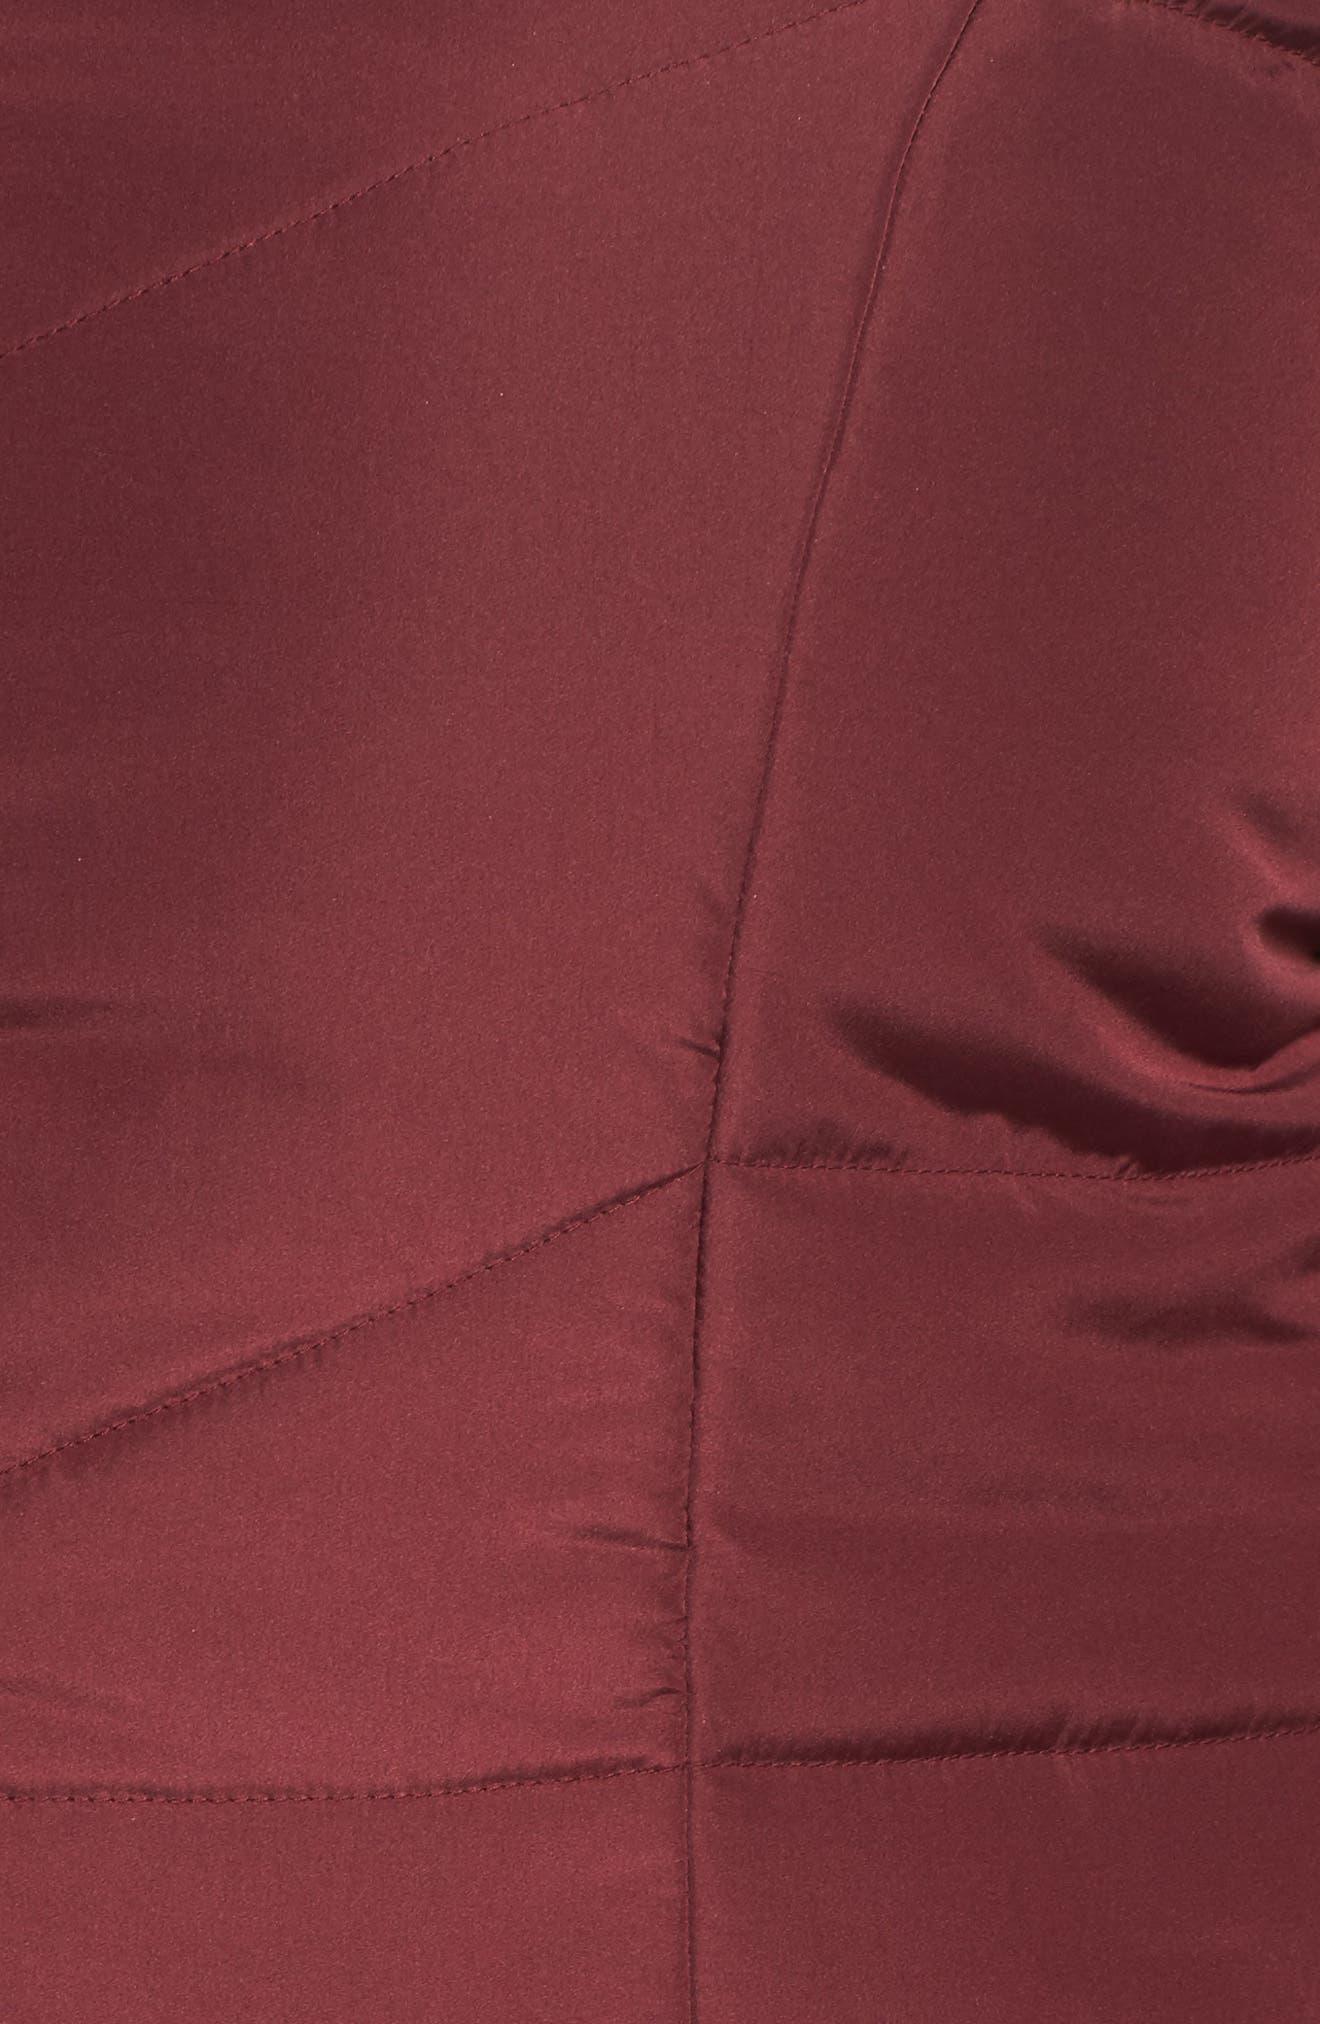 Valsi Puffer Jacket,                             Alternate thumbnail 6, color,